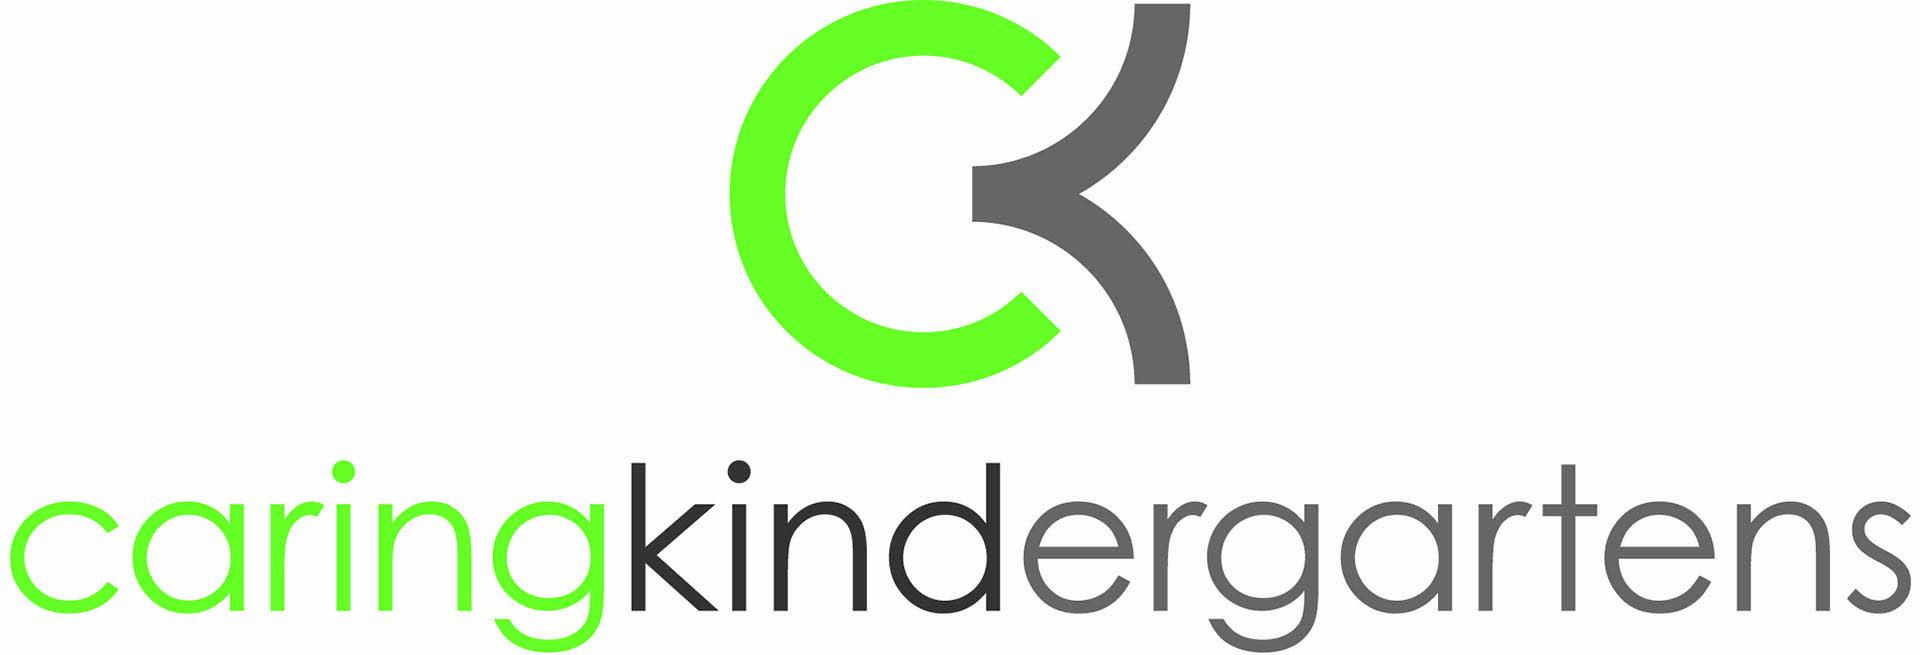 Caring Kindergartens's logo